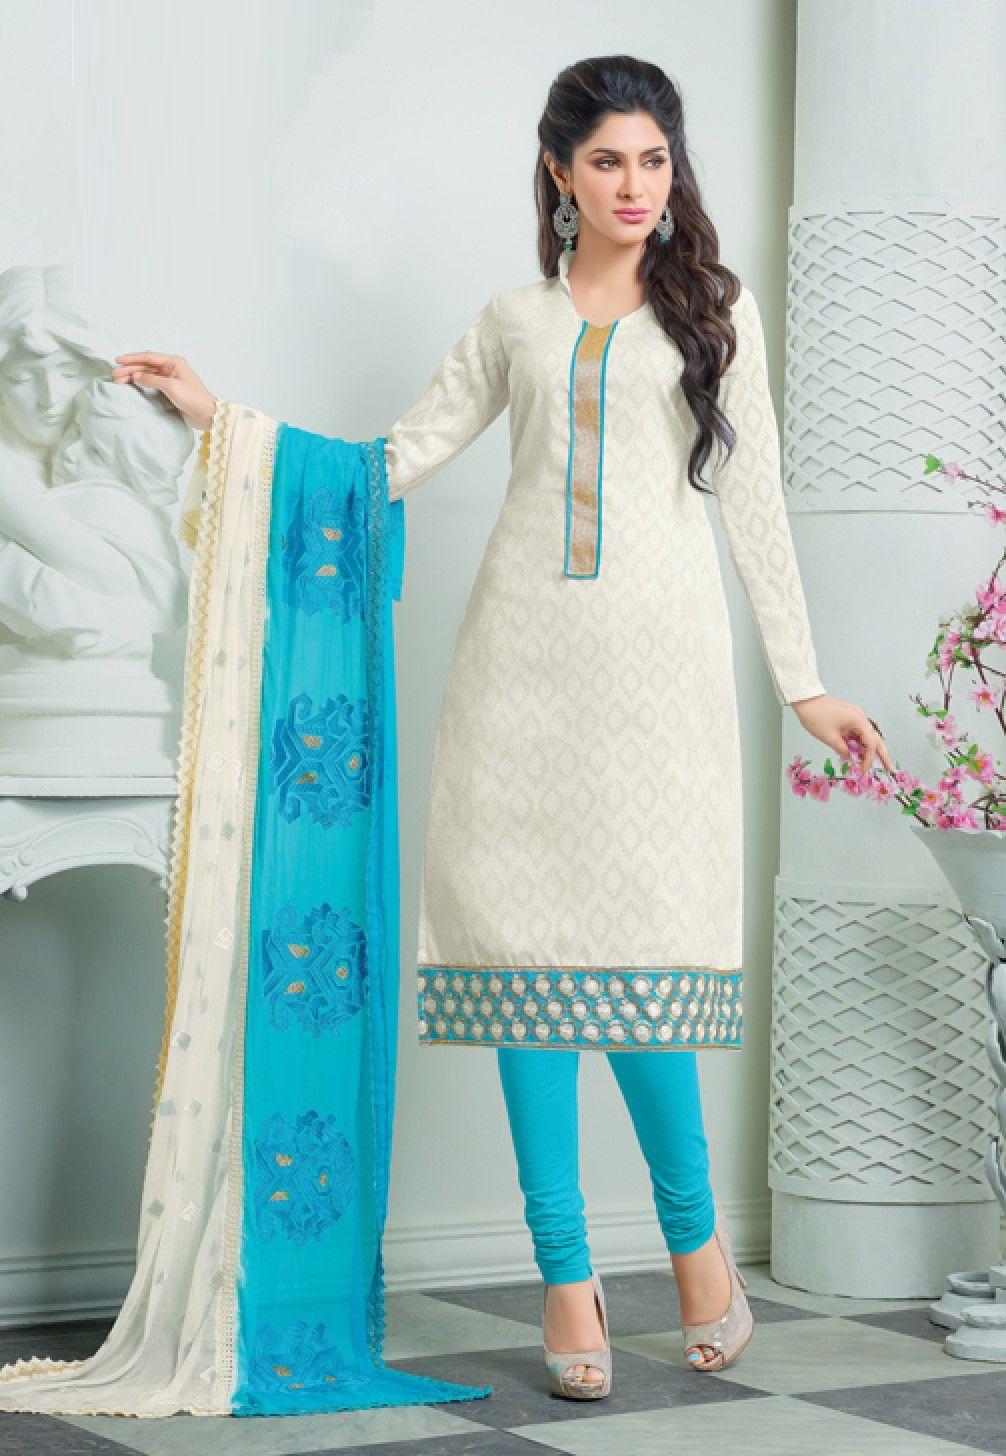 Classy White & Blue Churidar Salwar Suit Dress Material-2011